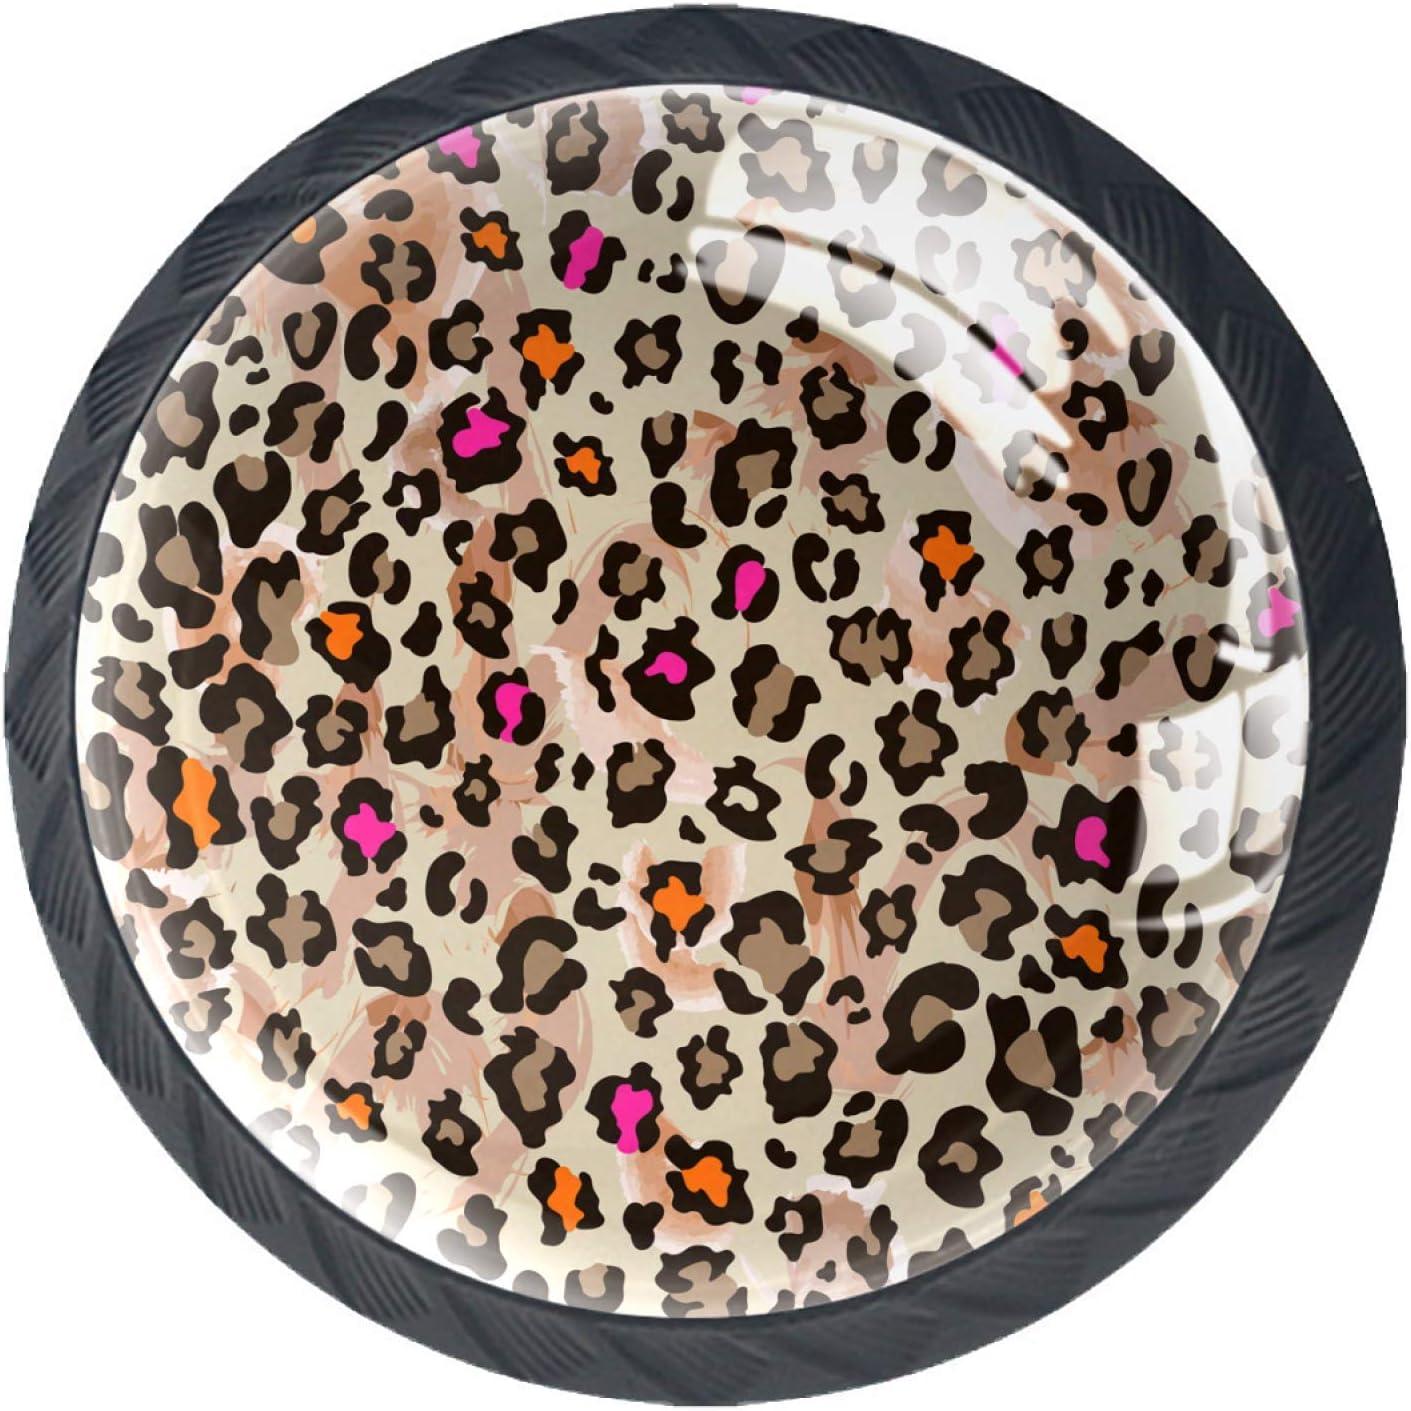 Cabinet Knobs Leopard Print Drawer Knobs Modern Pull Handles 4-P